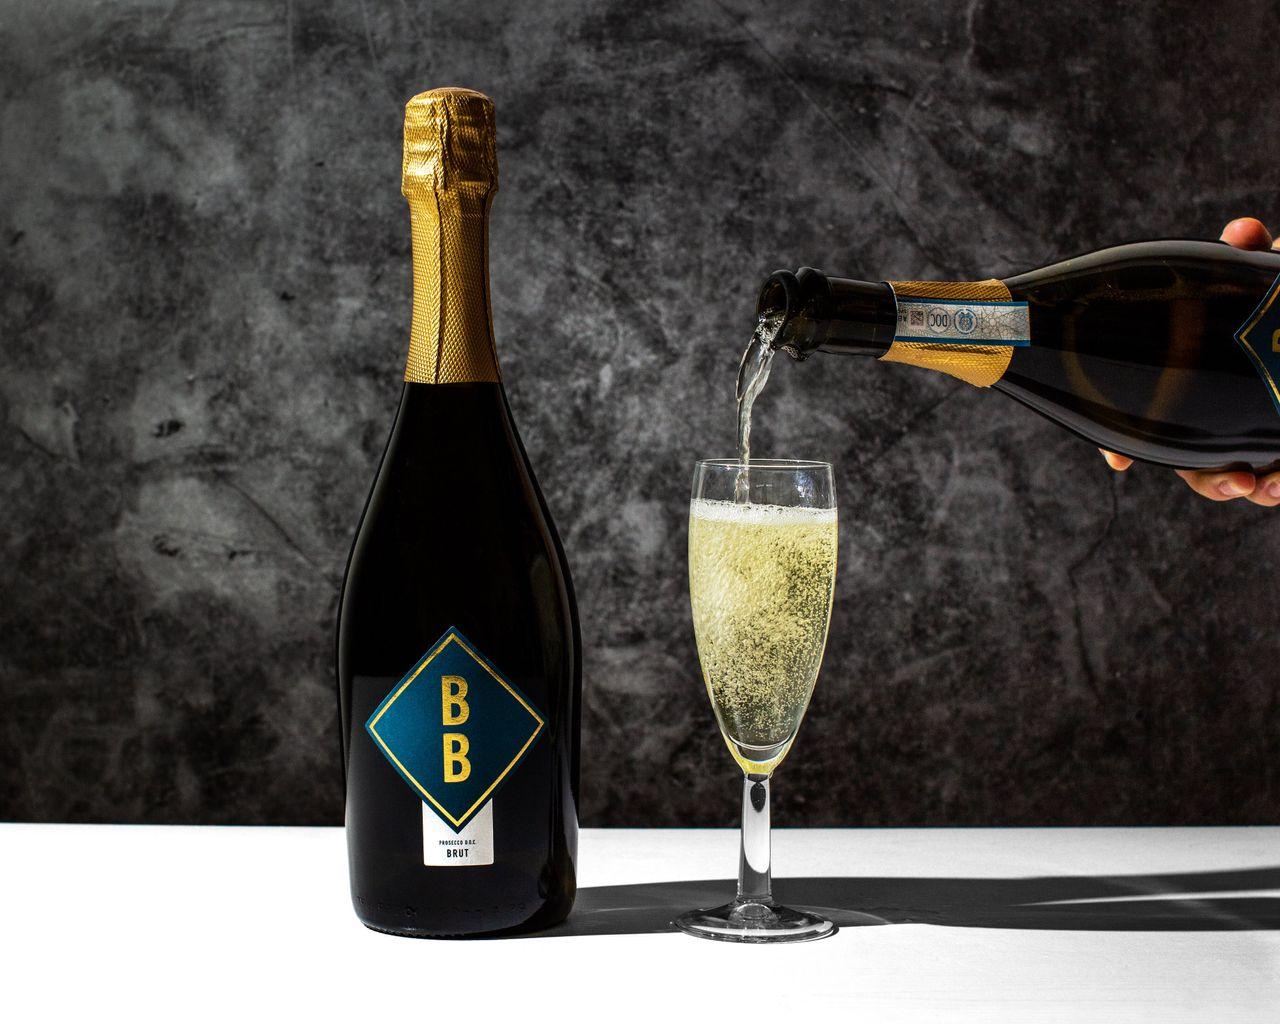 Bottle - BB Brut Prosecco, Bubble Bros Ltd